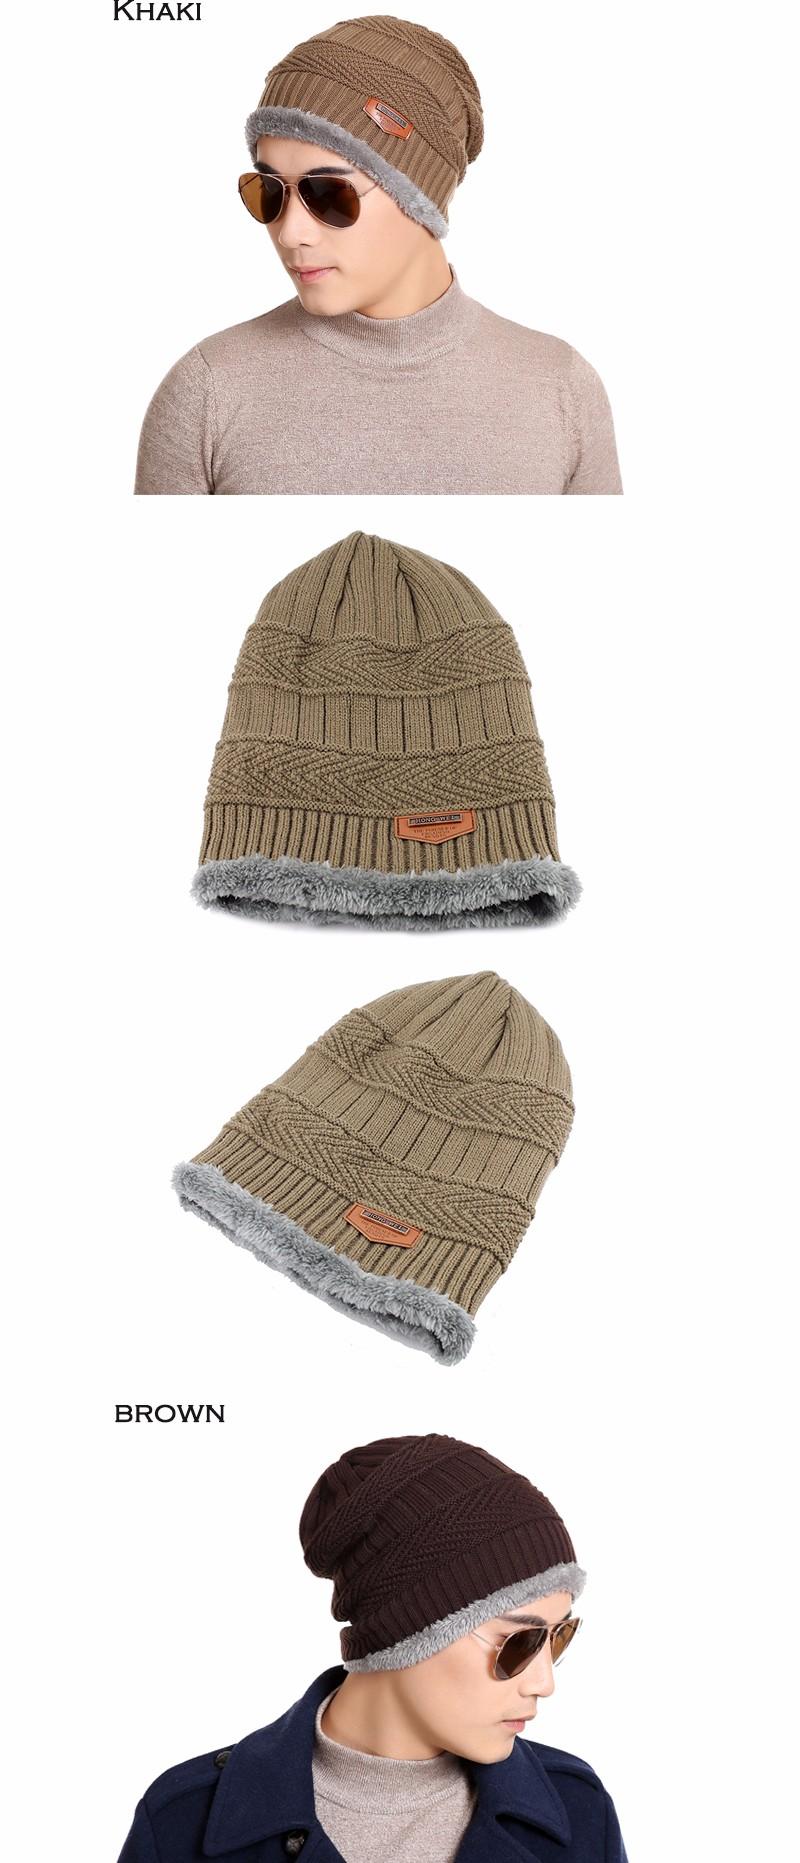 FETSBUY Pure Color Winter Skullies Beanies Hat Knit Winter Hat For Man Warm Hat Velvet Cap Bonnet Toucas Inverno Knitted Hats 18